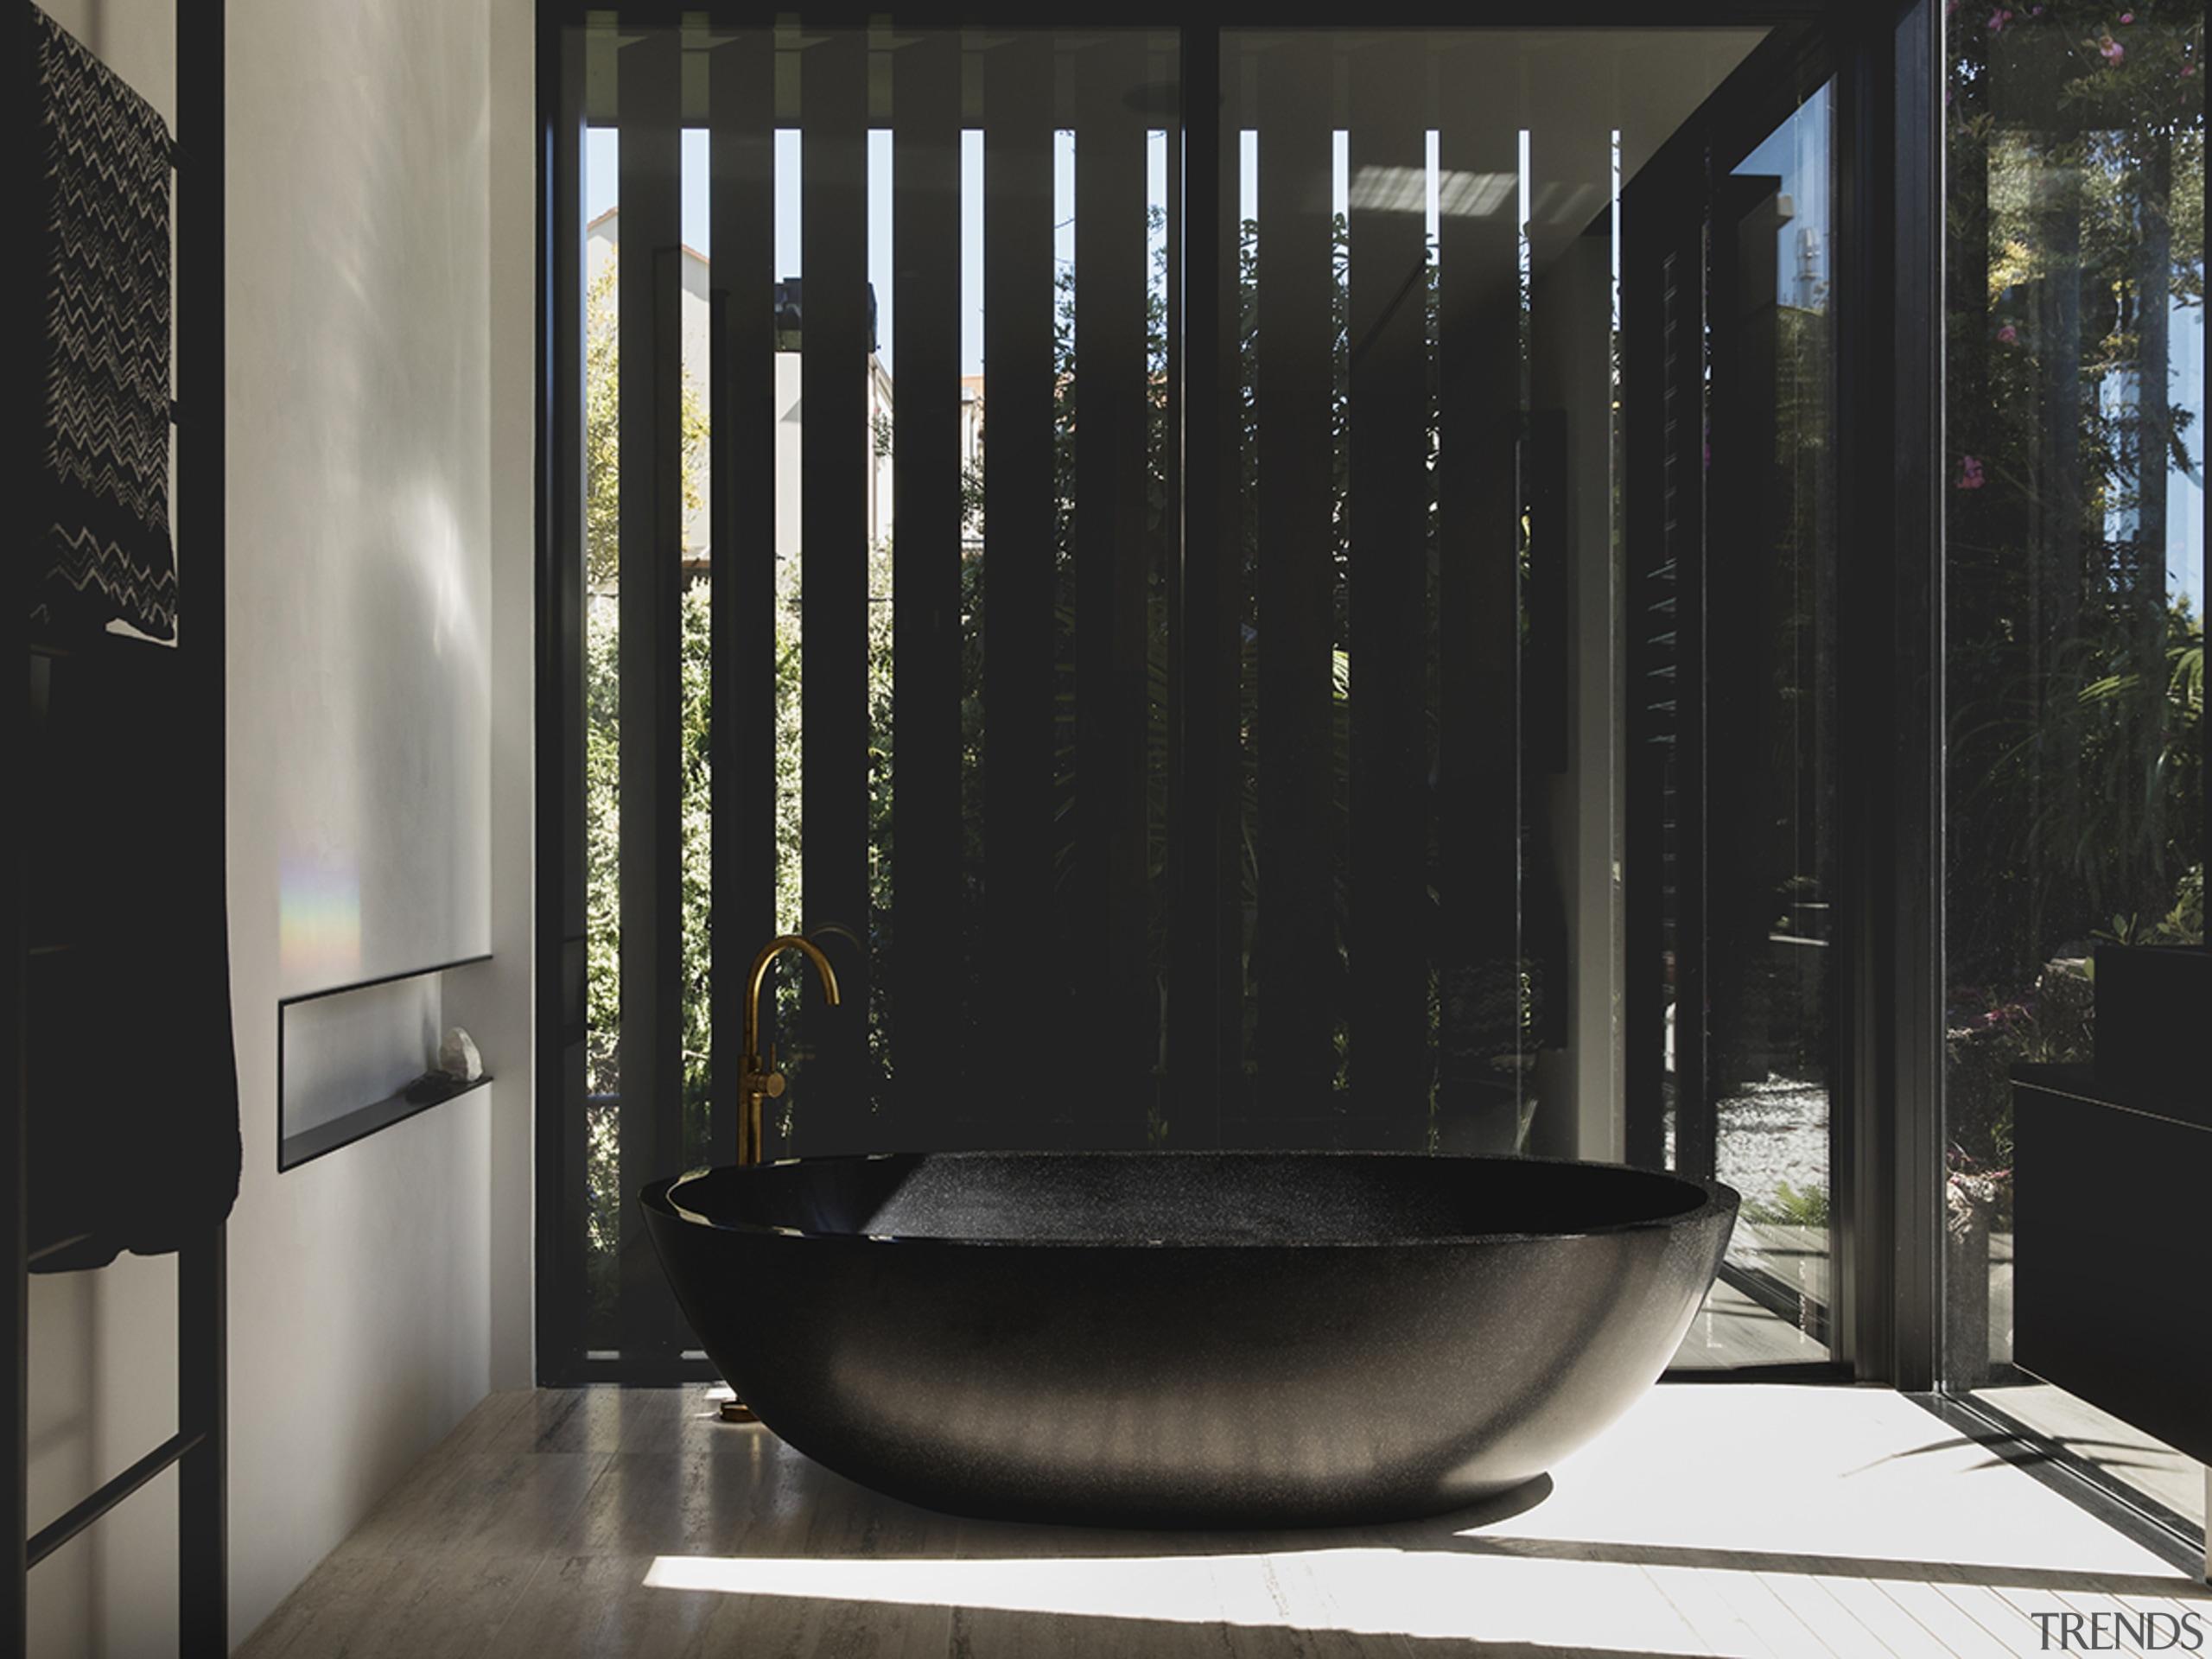 Read the full story. architecture, bathroom, floor, glass, house, interior design, plumbing fixture, room, black